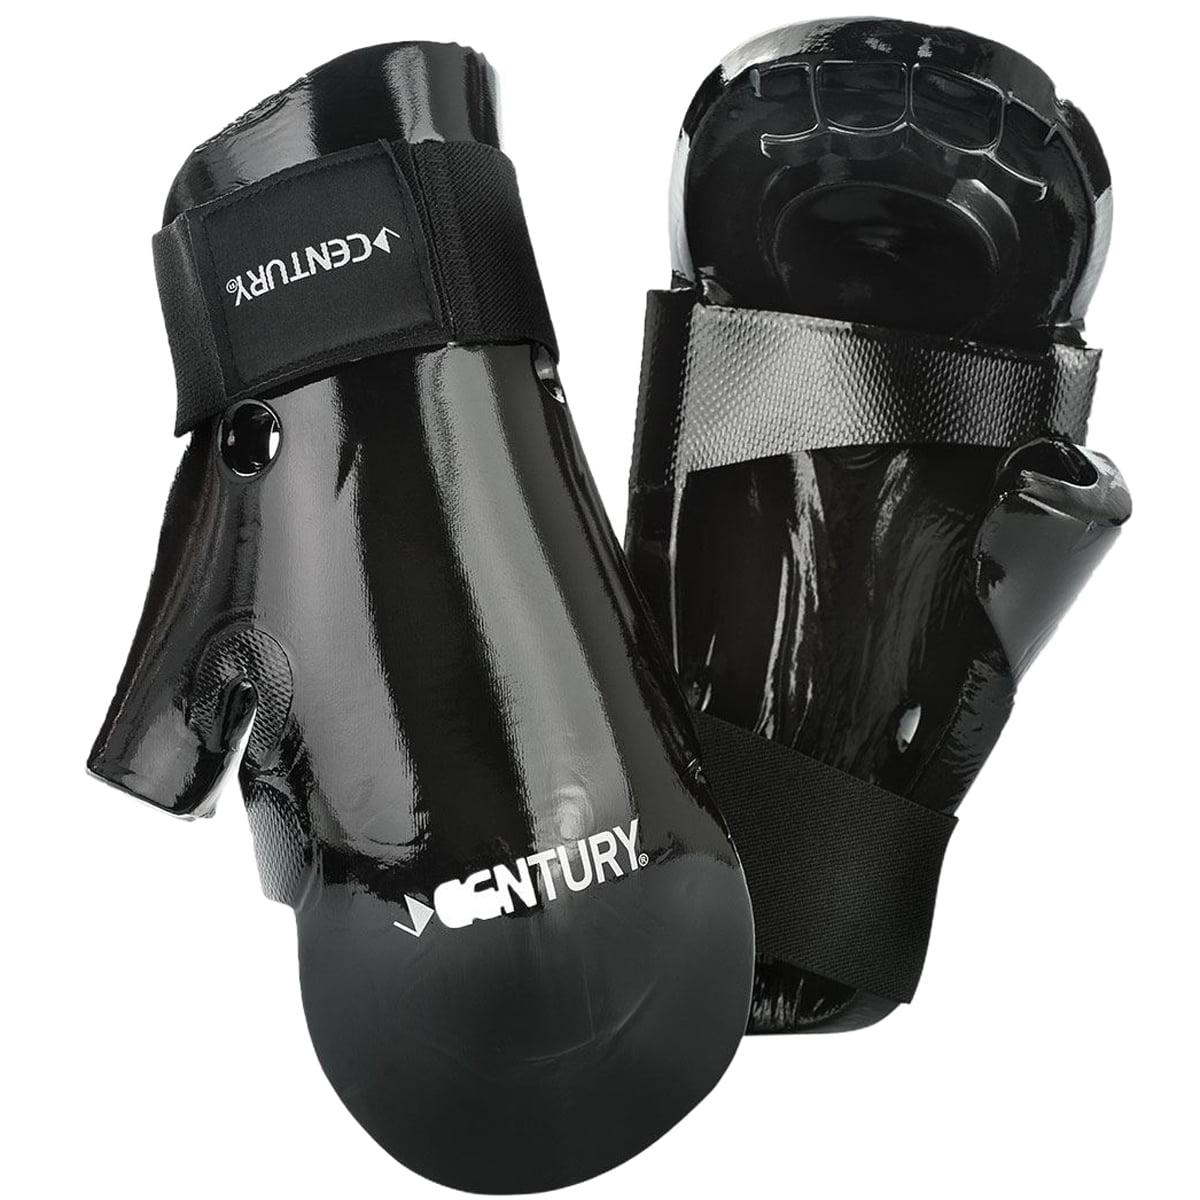 Century Sparring Gloves   Any Size Karate Taekwondo Martial Arts c1153